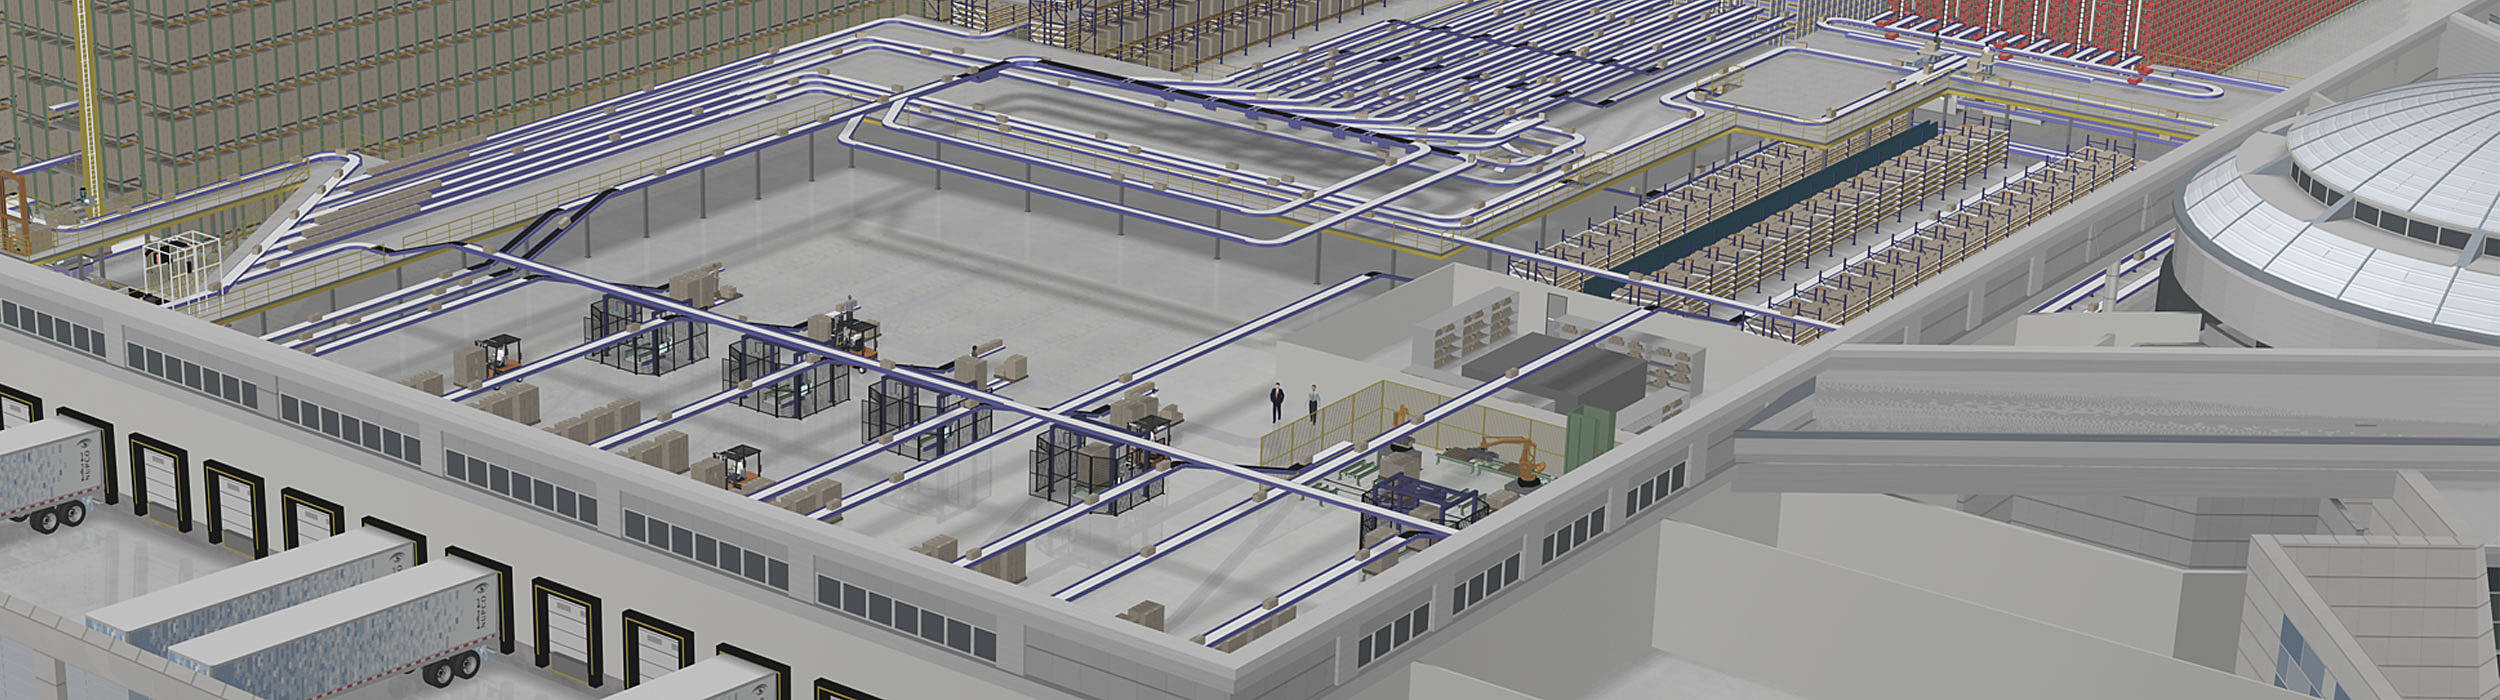 Toyota Material Handling: Sistemi logistici Integrati